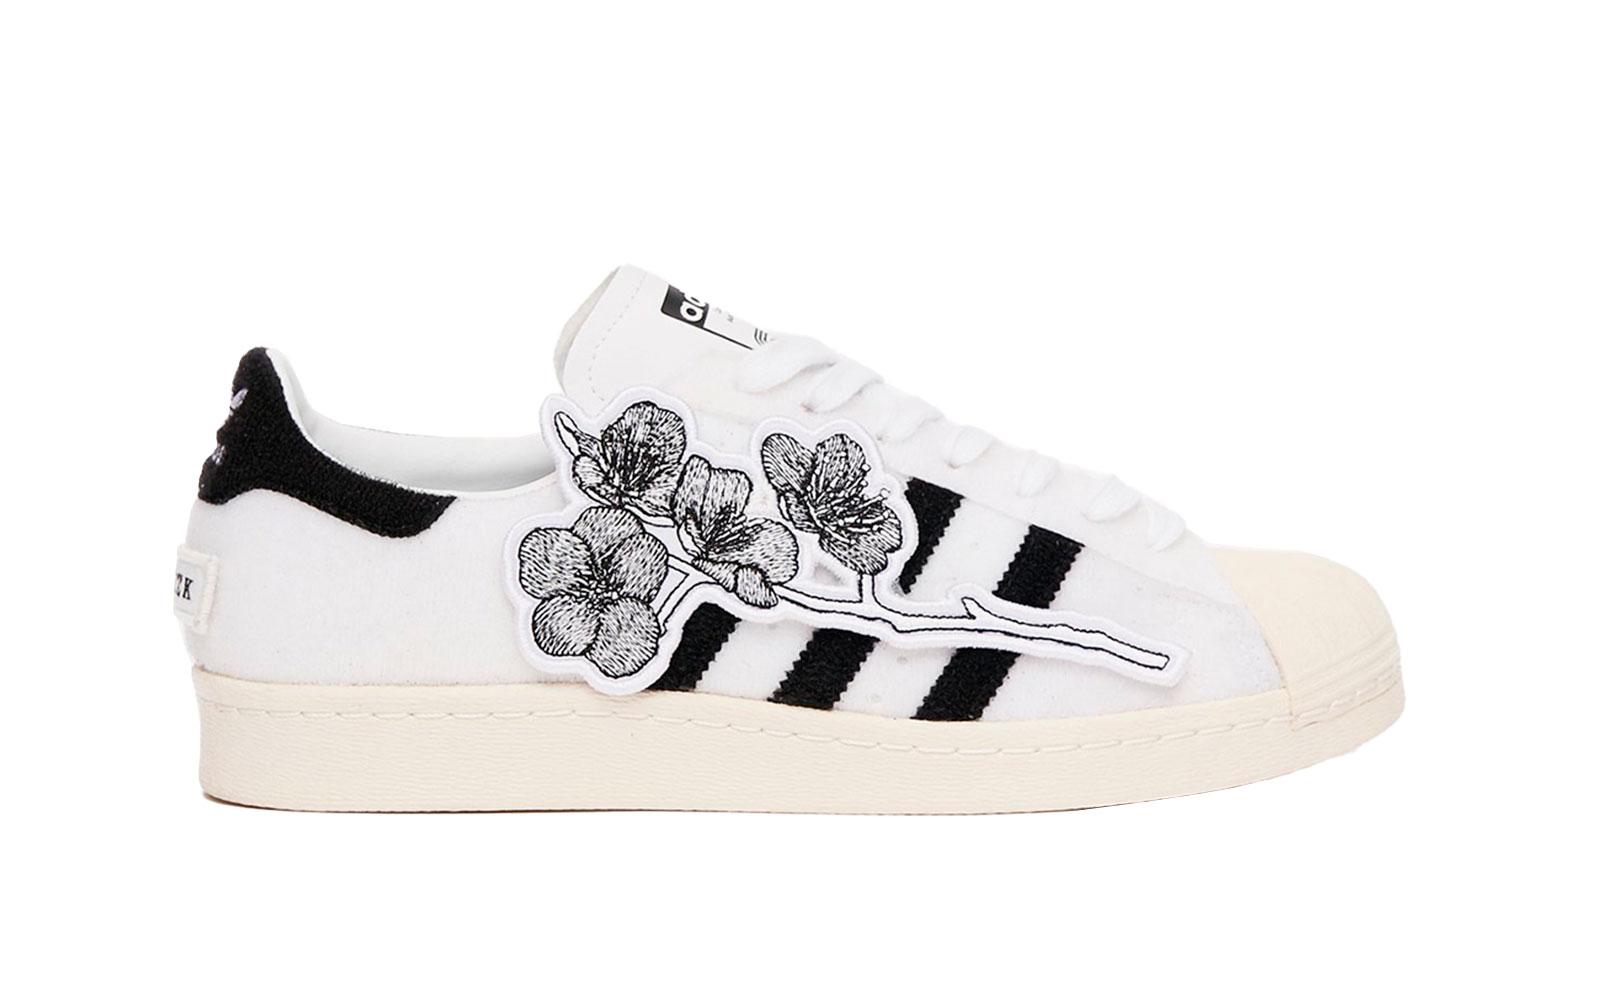 Sneakersnstuff x Kazuki Kuraishi x adidas Superstar